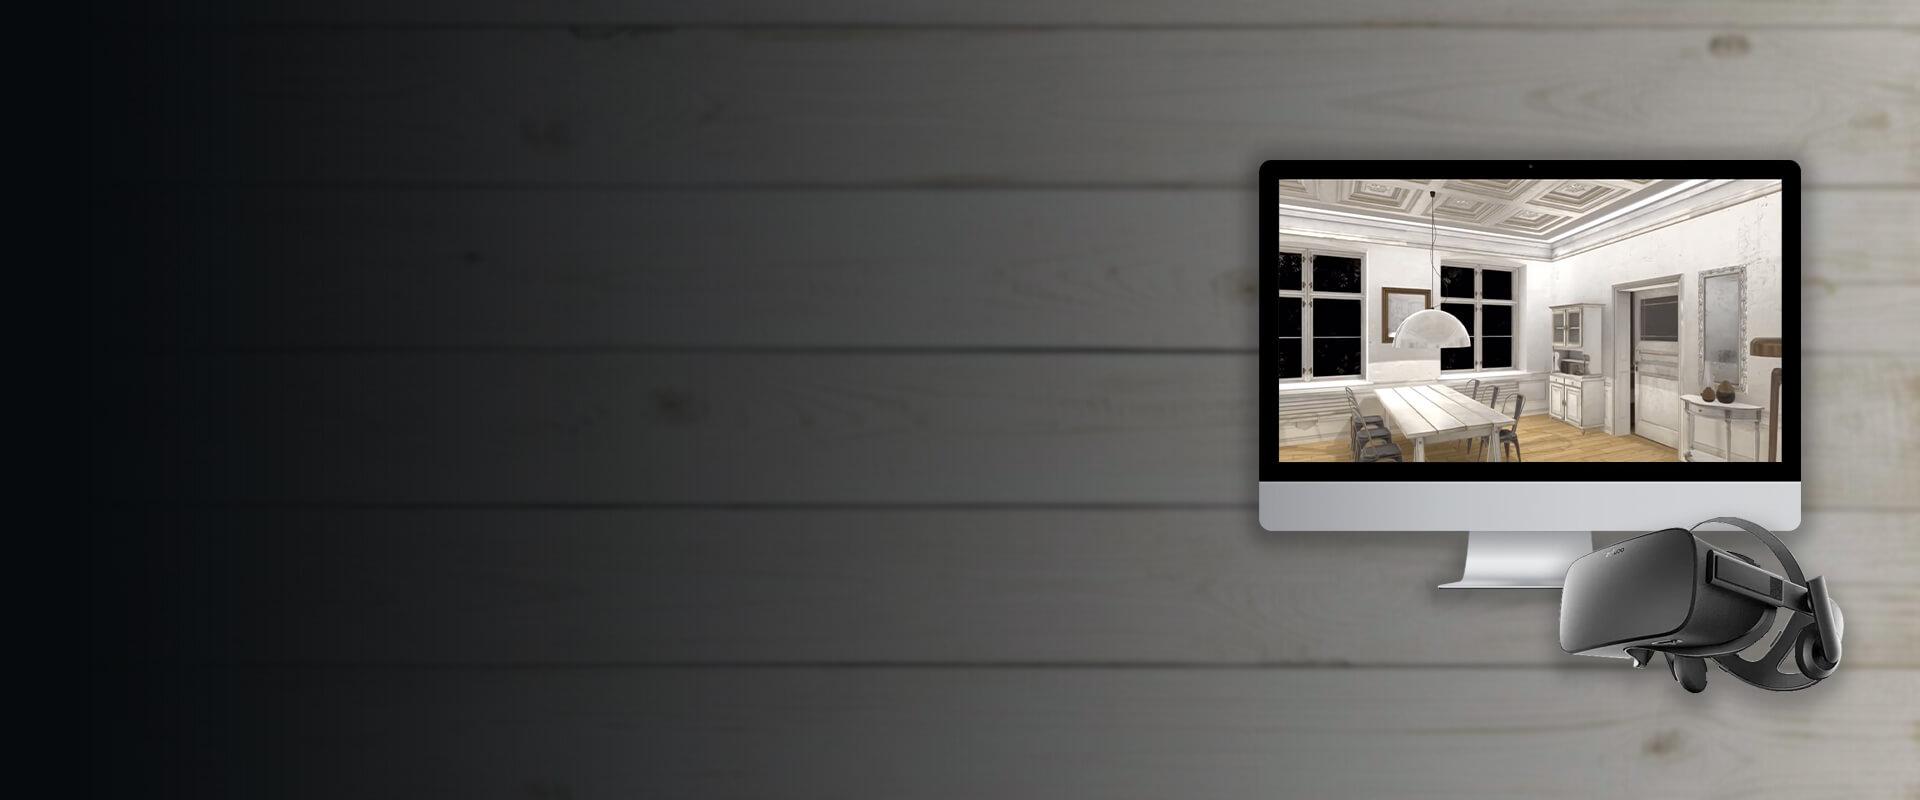 VR Interior Visualization - Visartech Portfolio